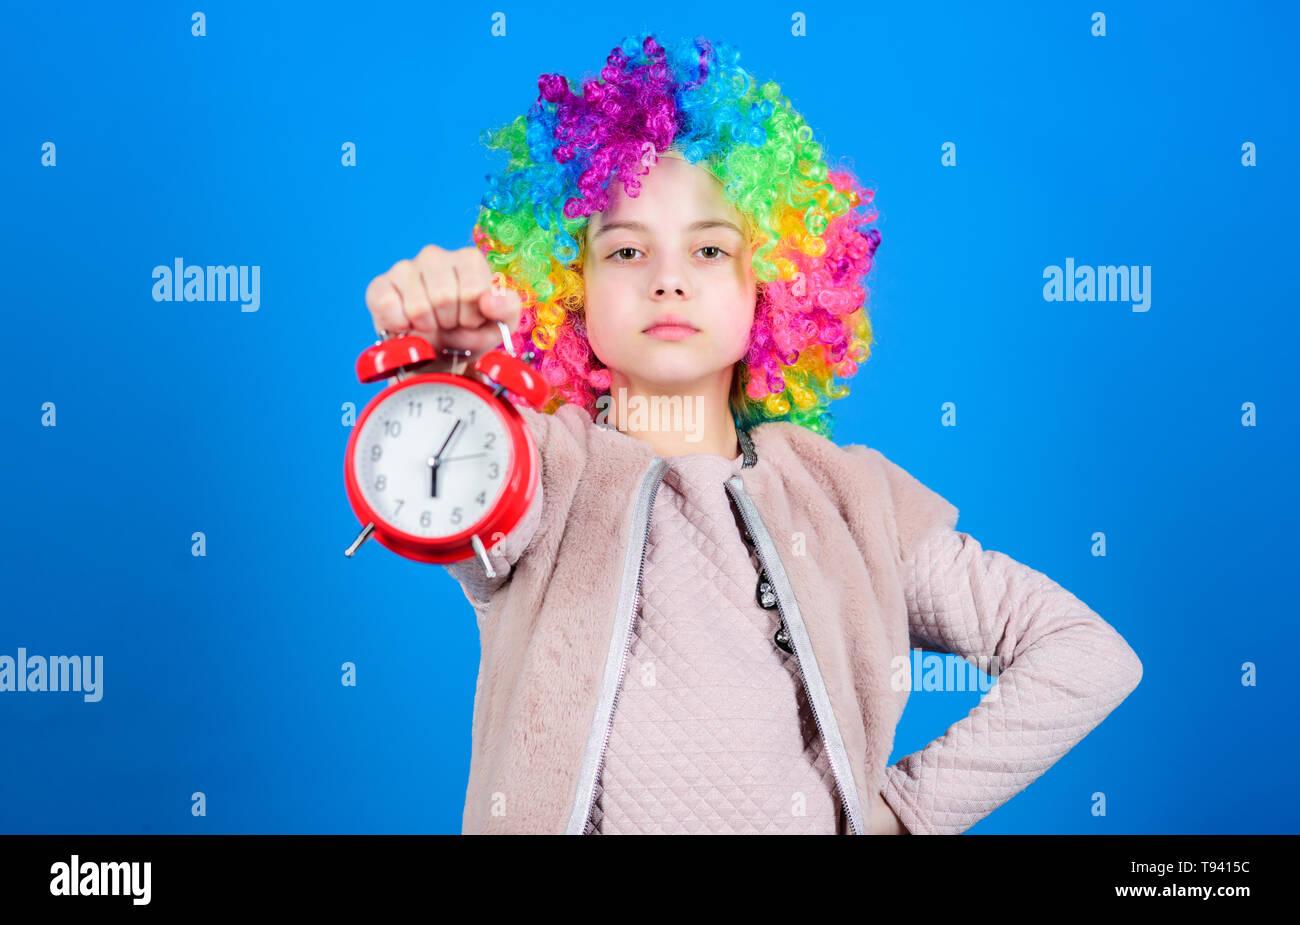 Punctual Girls Next Dress 18-24 Months Baby & Toddler Clothing